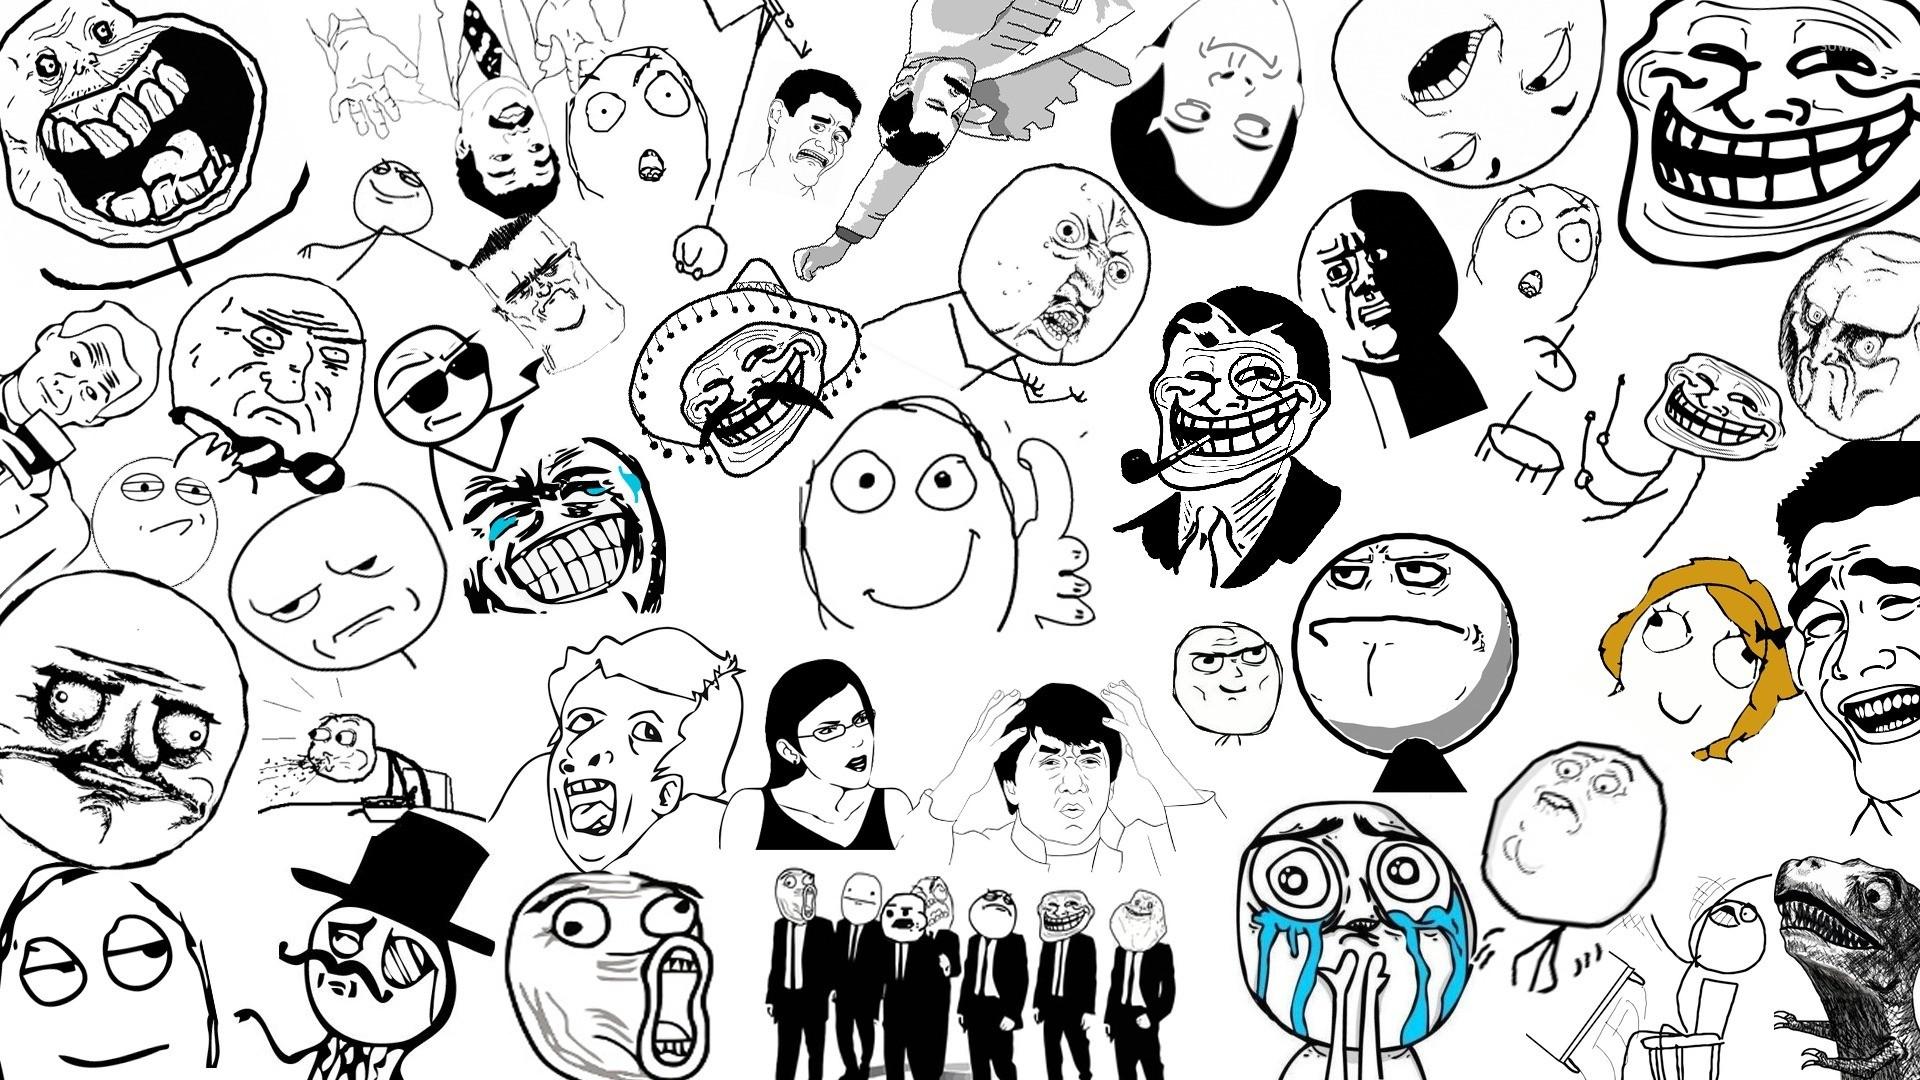 Troll captain wallpaper – Meme wallpapers – #23200